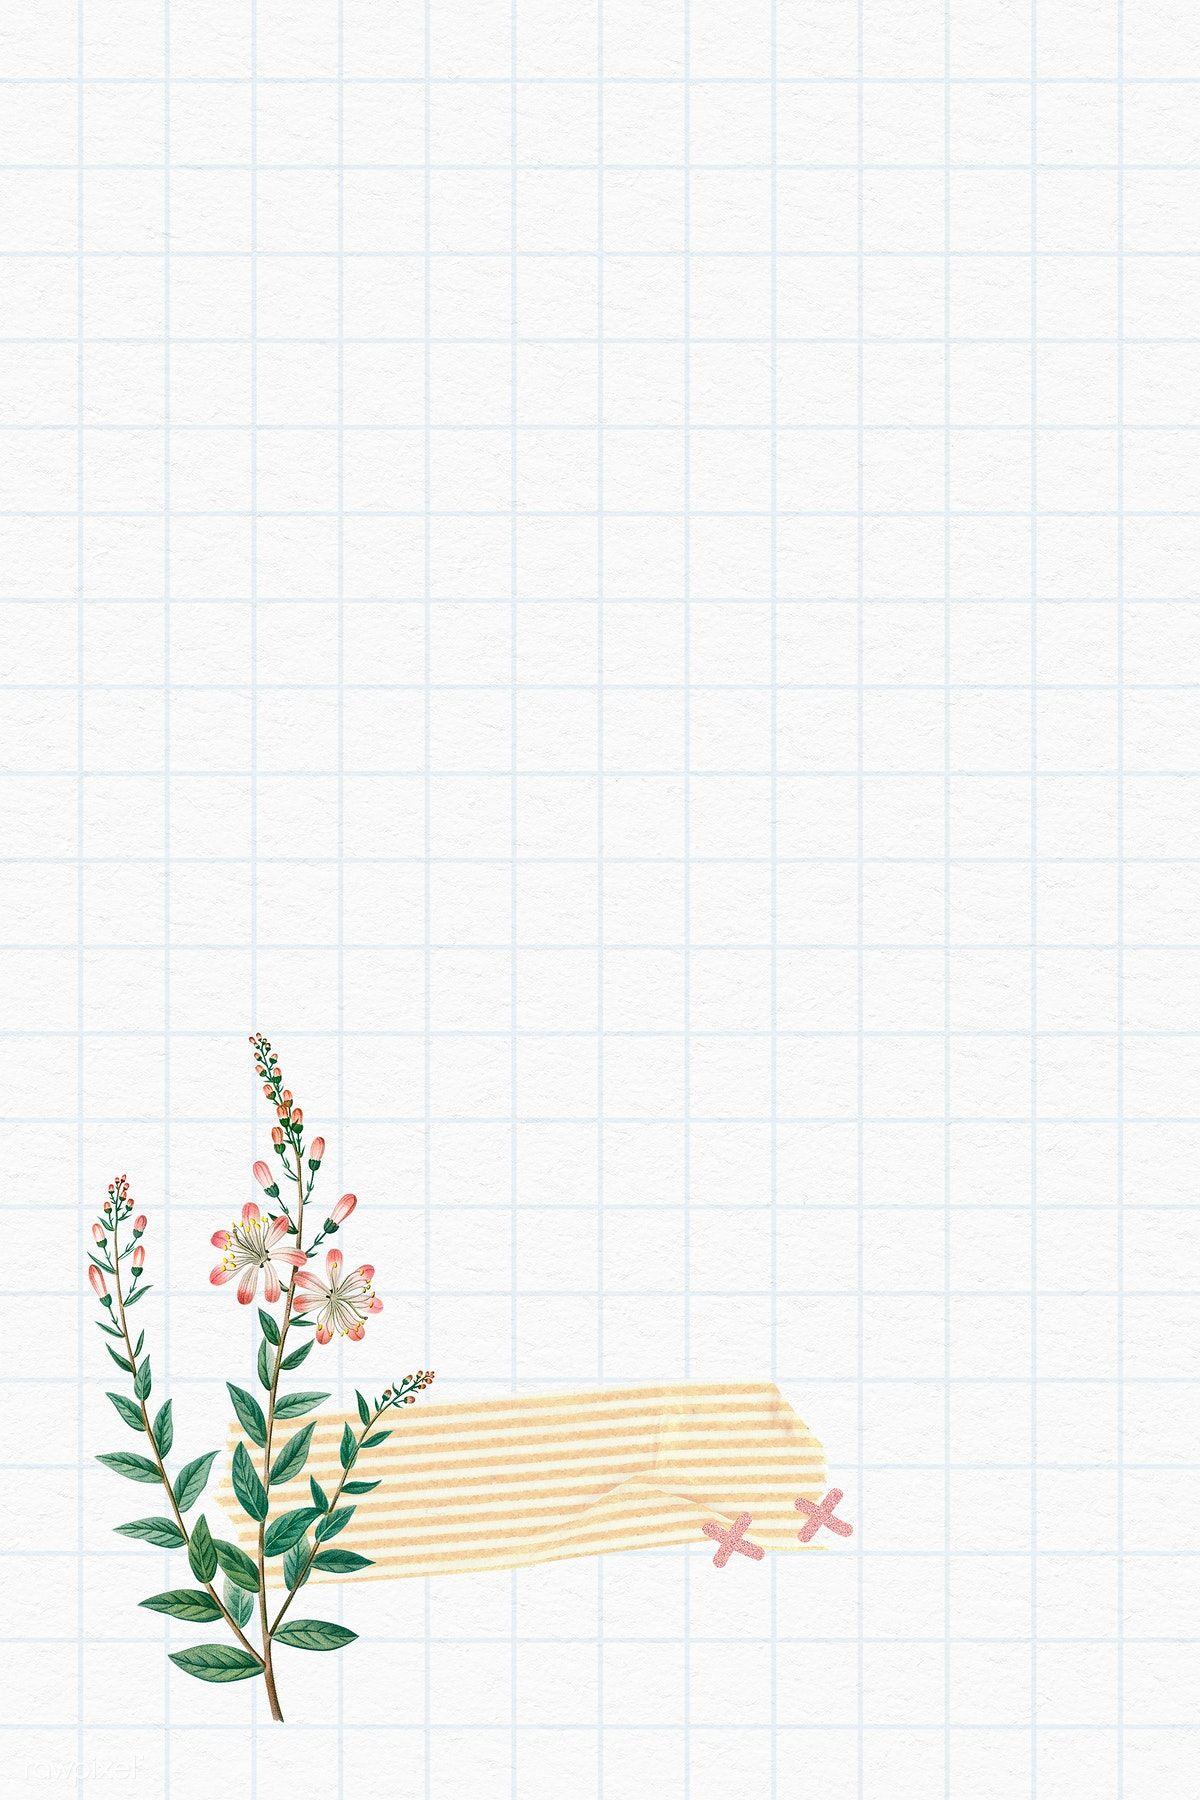 Tarflower On Grid Background Illustration Premium Image By Rawpixel Com Ningzk V In 2020 Instagram Frame Template Photo Collage Template Instagram Photo Frame